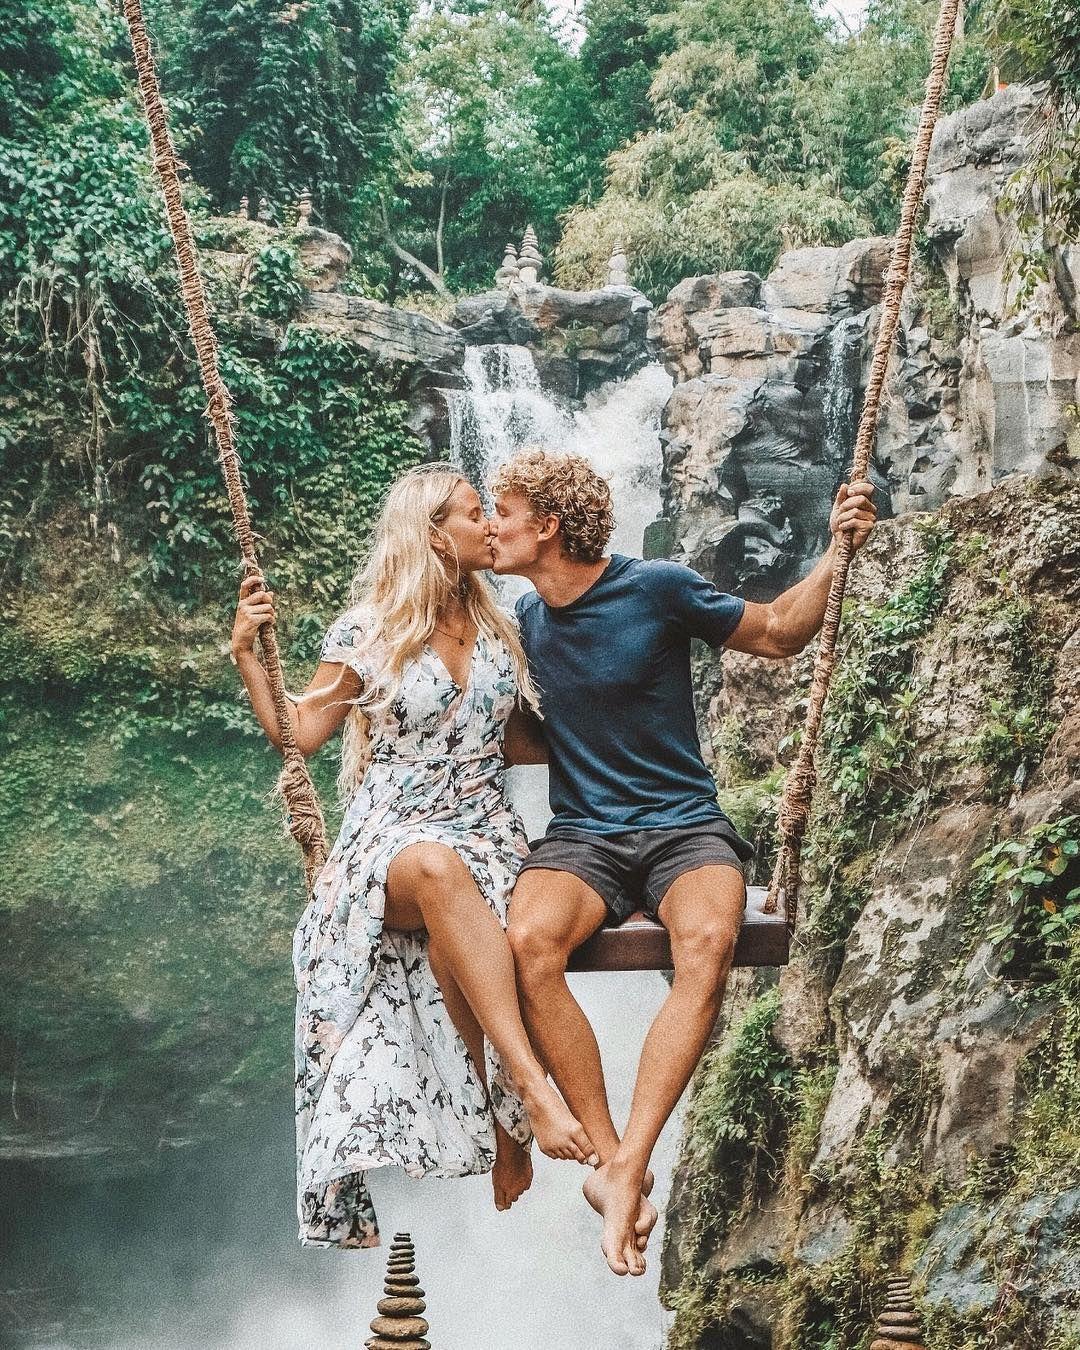 Merel Gebe on Instagram @merelgebe #merelgebe tegenungang waterfall bali swing dress love couple goals travel inspo ideas summer cute